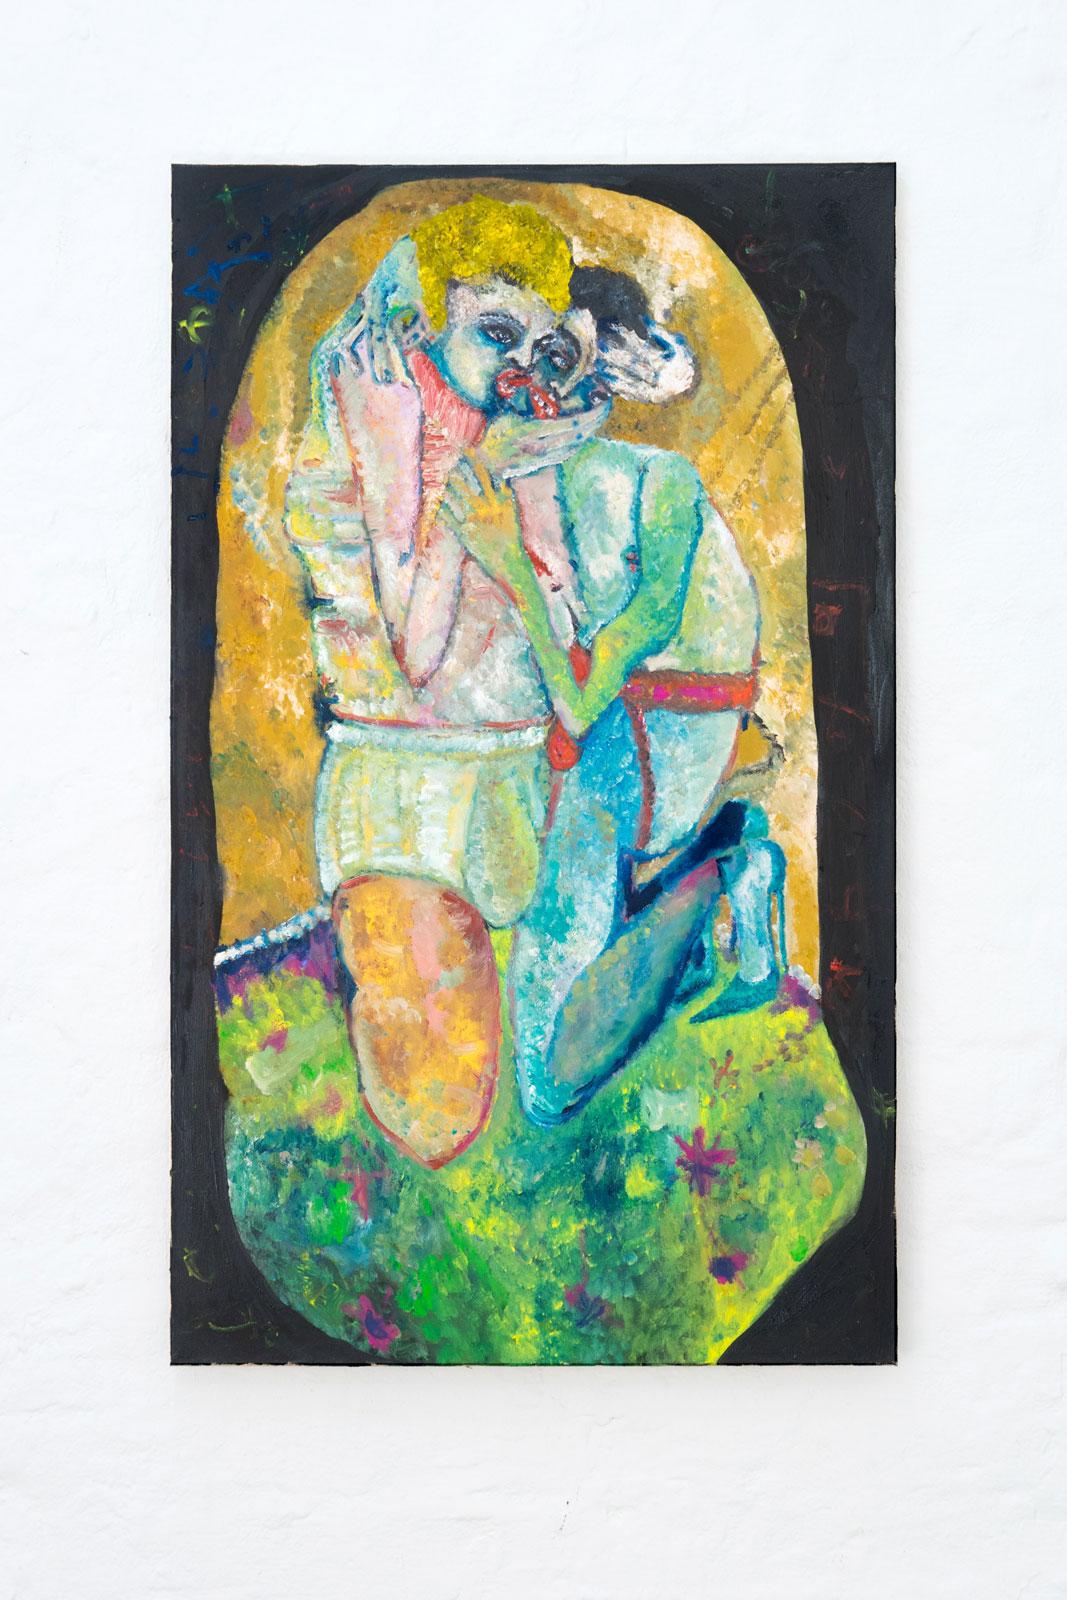 Joseph Geagan, Das Leck, 2018, Oil on canvas, 116 x 70 cm